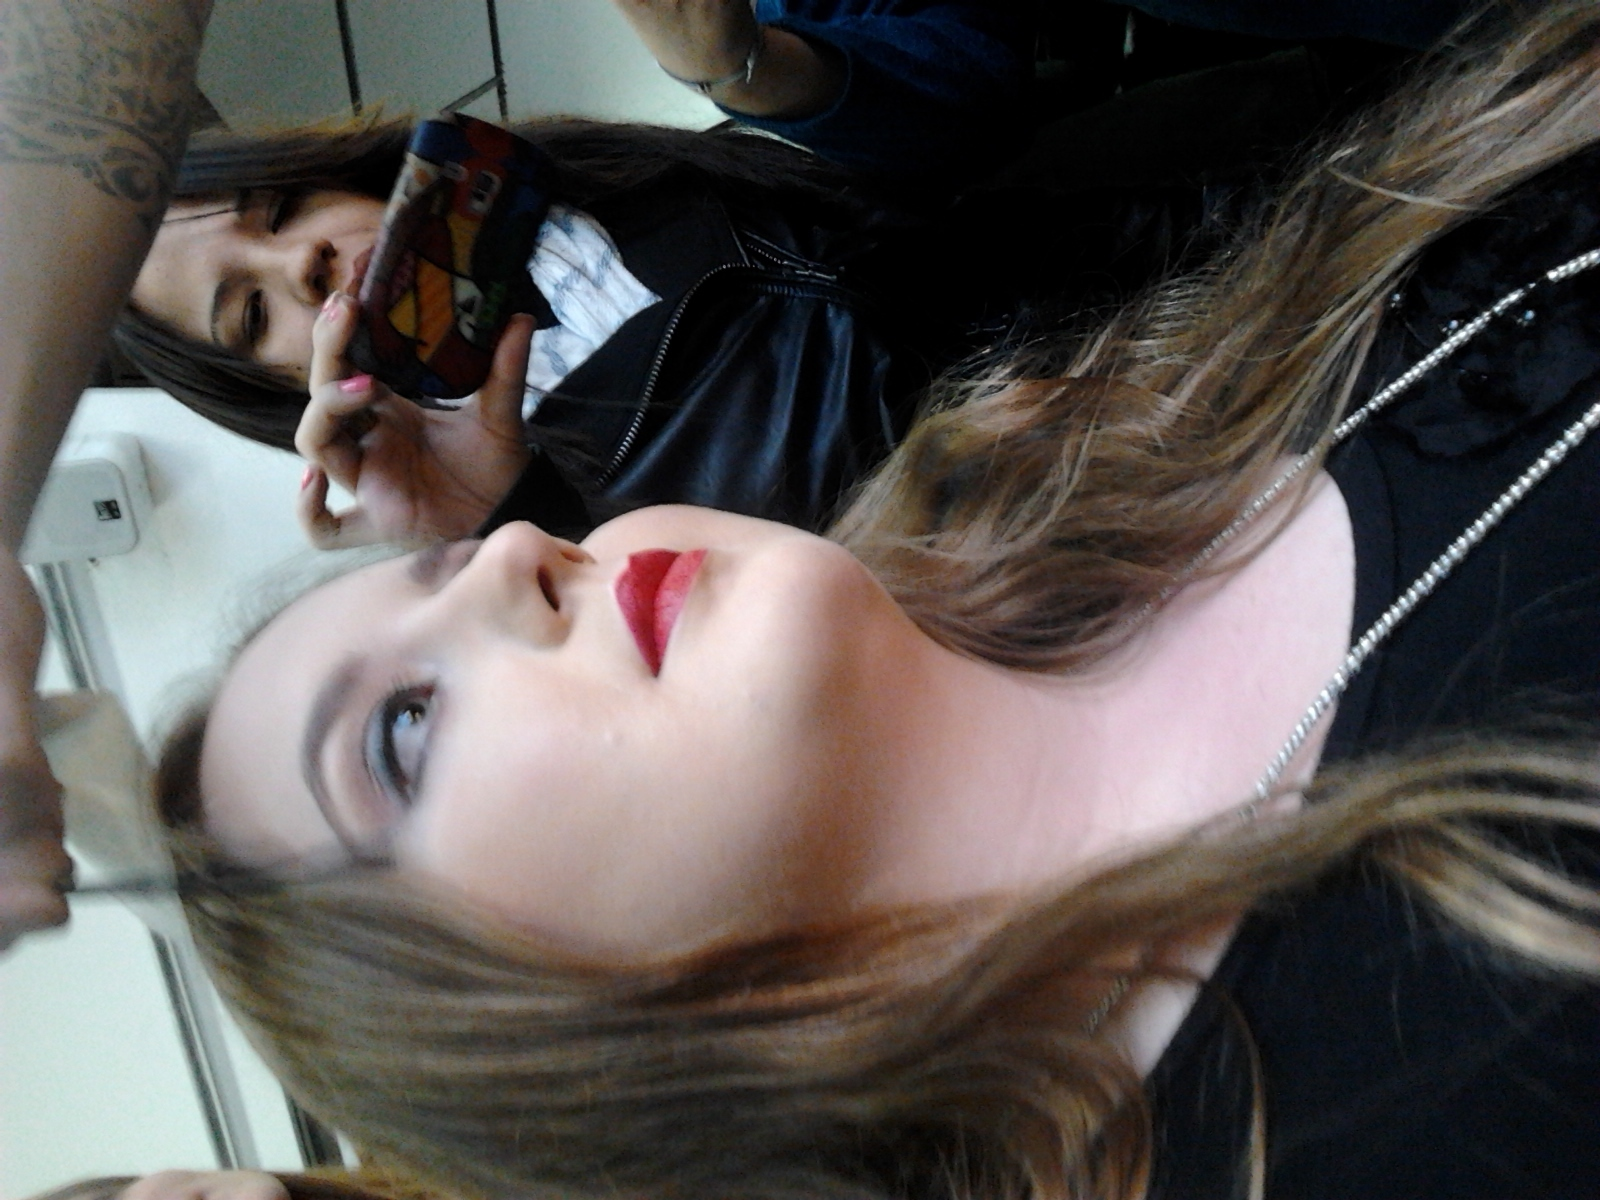 Maquiagem06 maquiador(a) consultor(a) de estetica